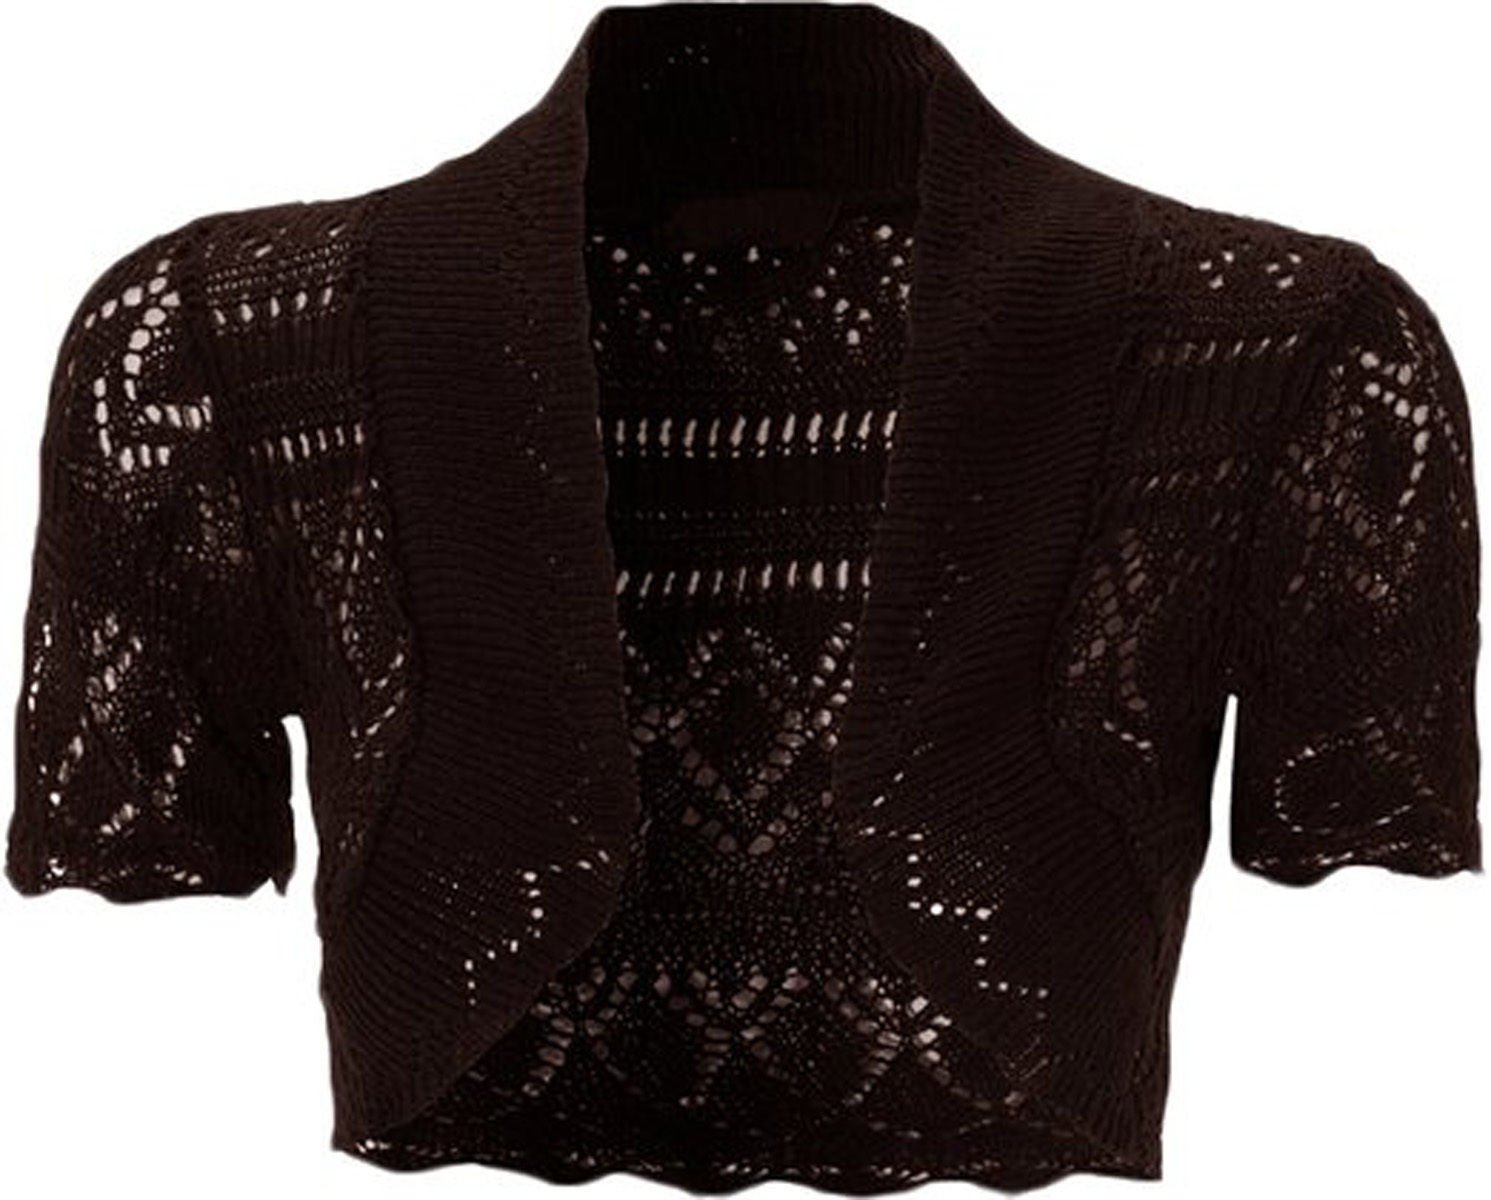 Fashion & Freedom F&F Kids Girls Short Sleeve Knitted Crochet Bolero Shrug Cardigan